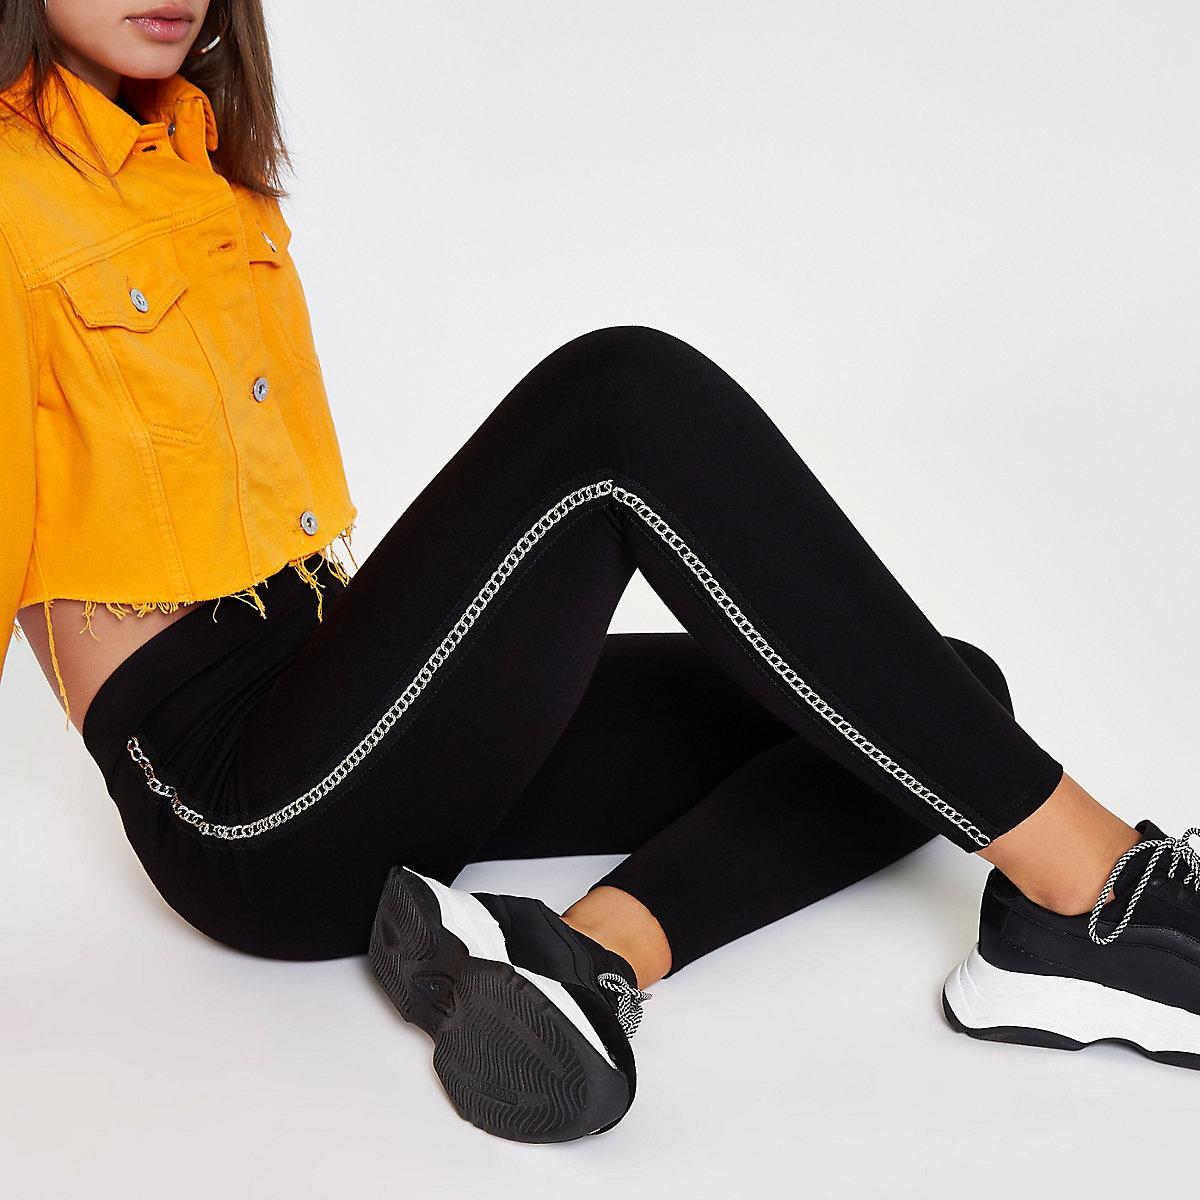 Black chain side trim leggings